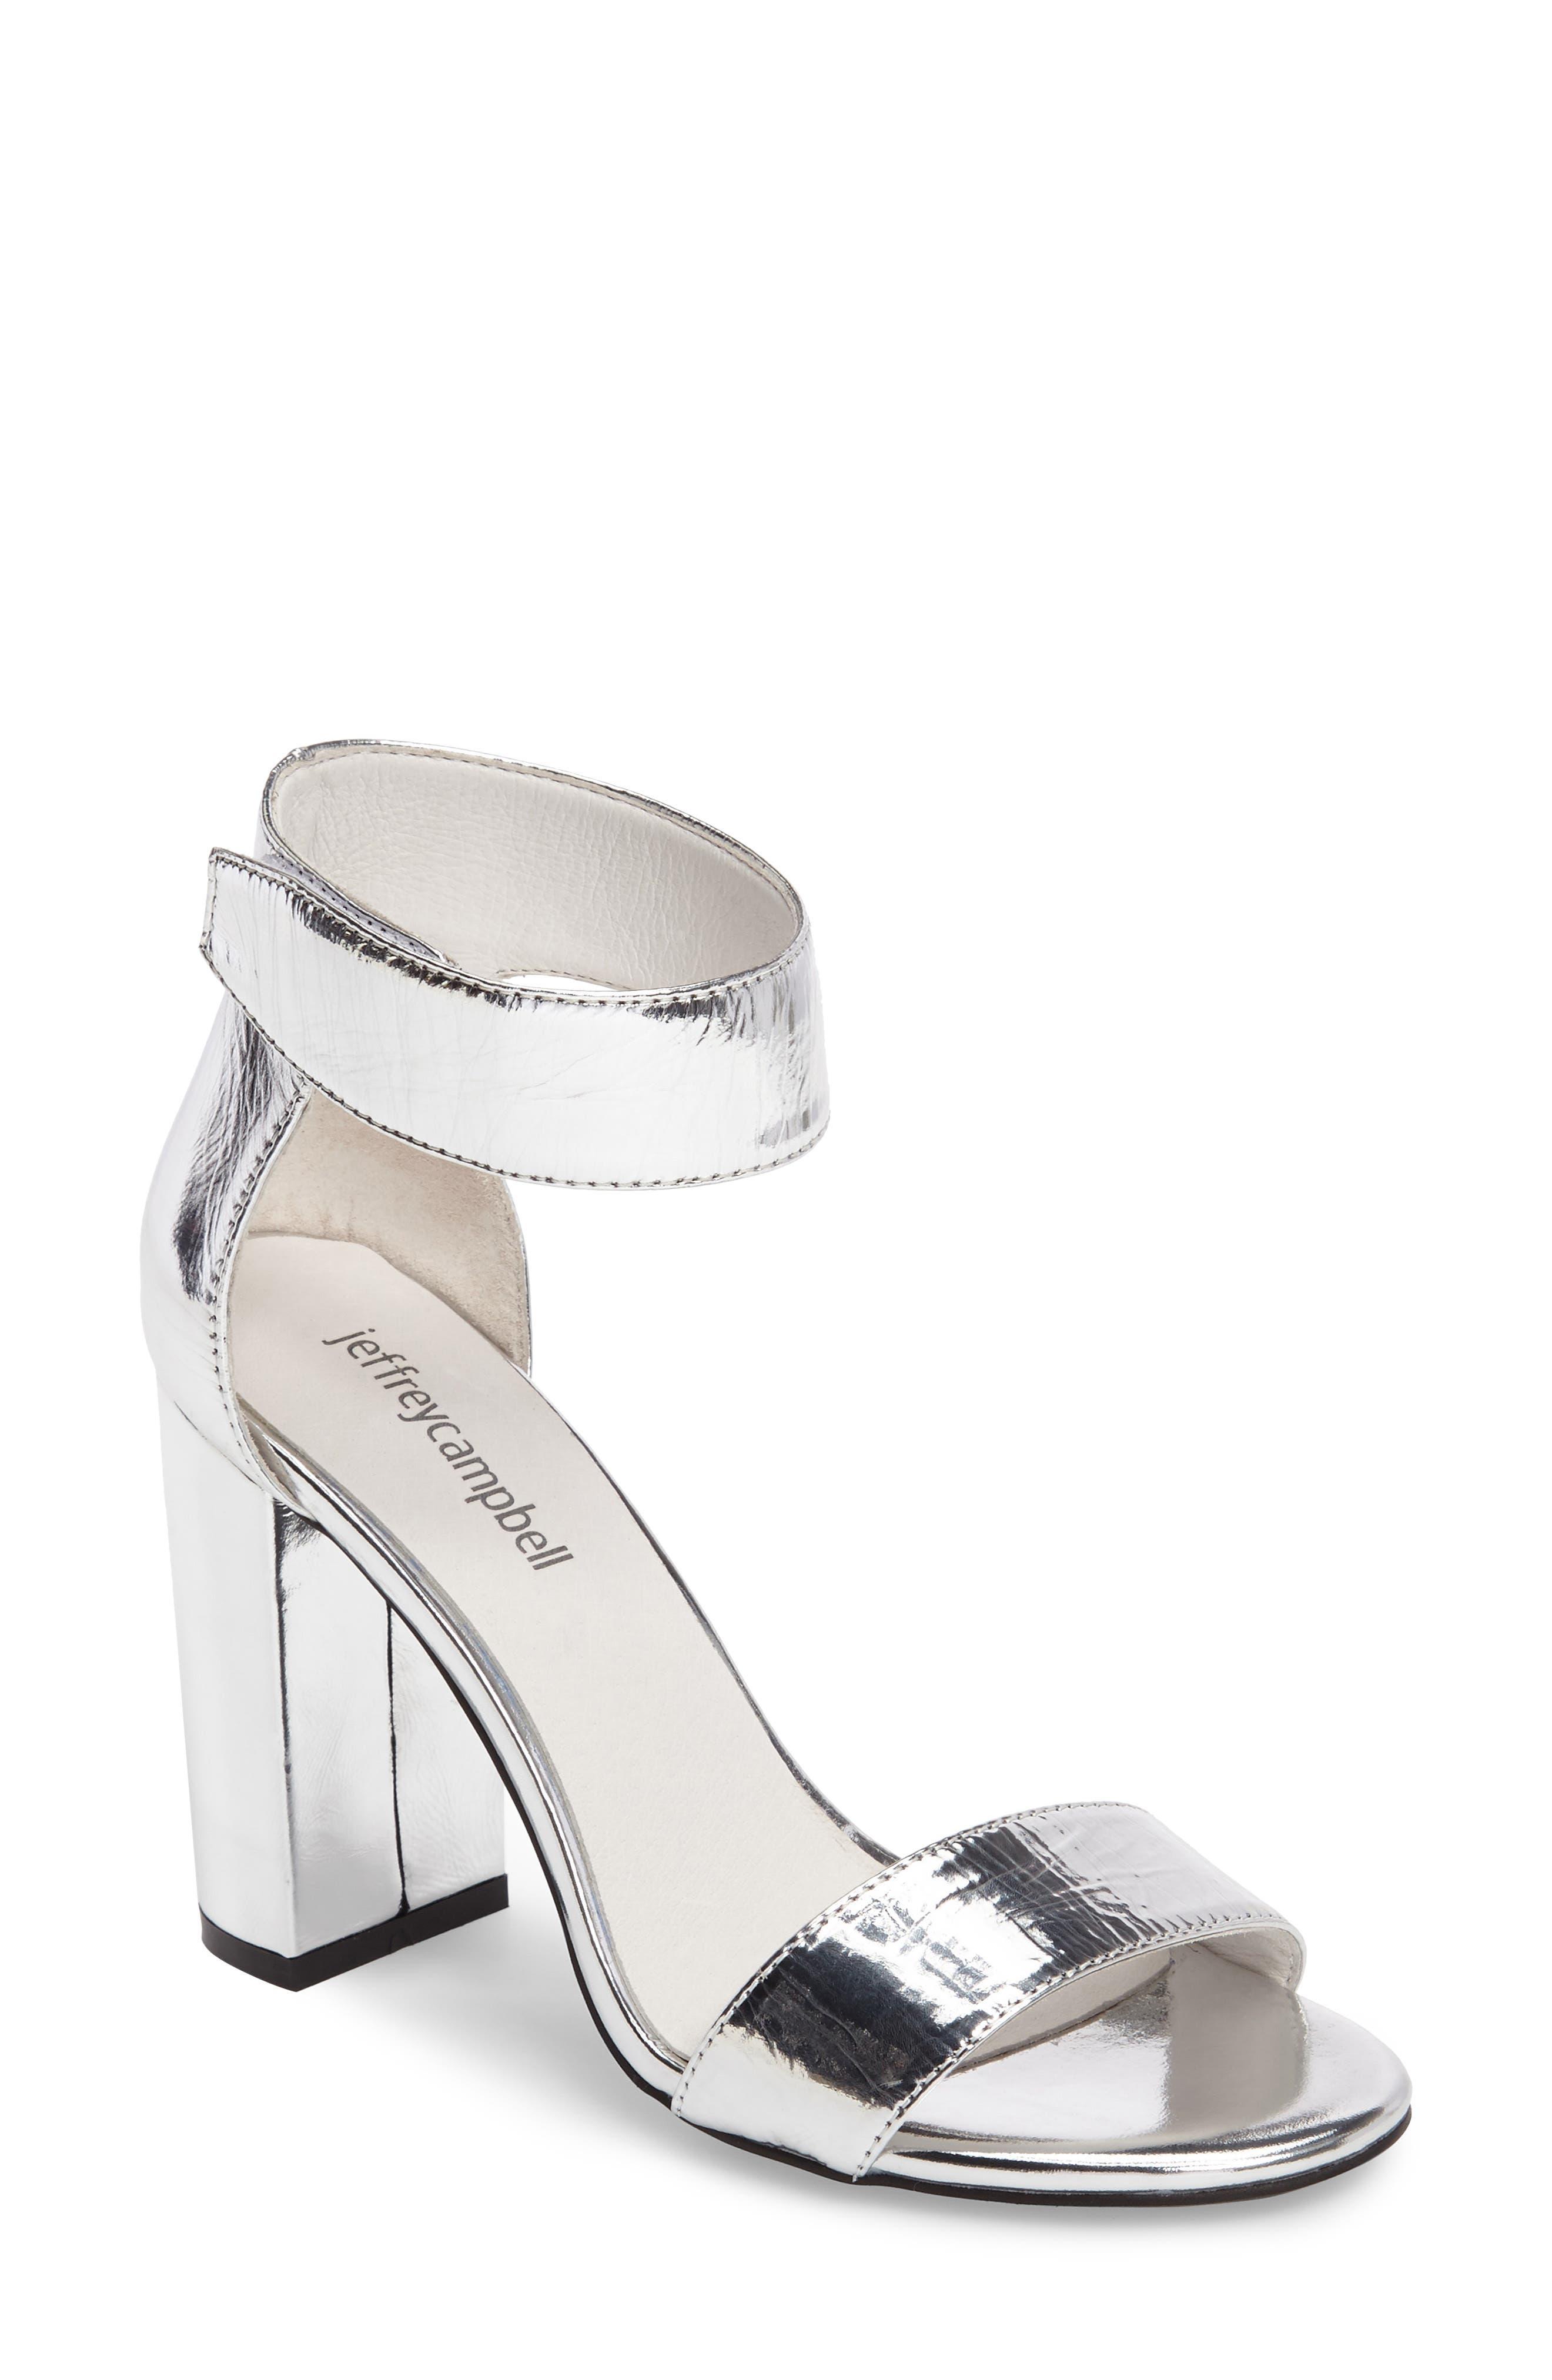 'Lindsay' Ankle Strap Sandal,                             Main thumbnail 1, color,                             Silver